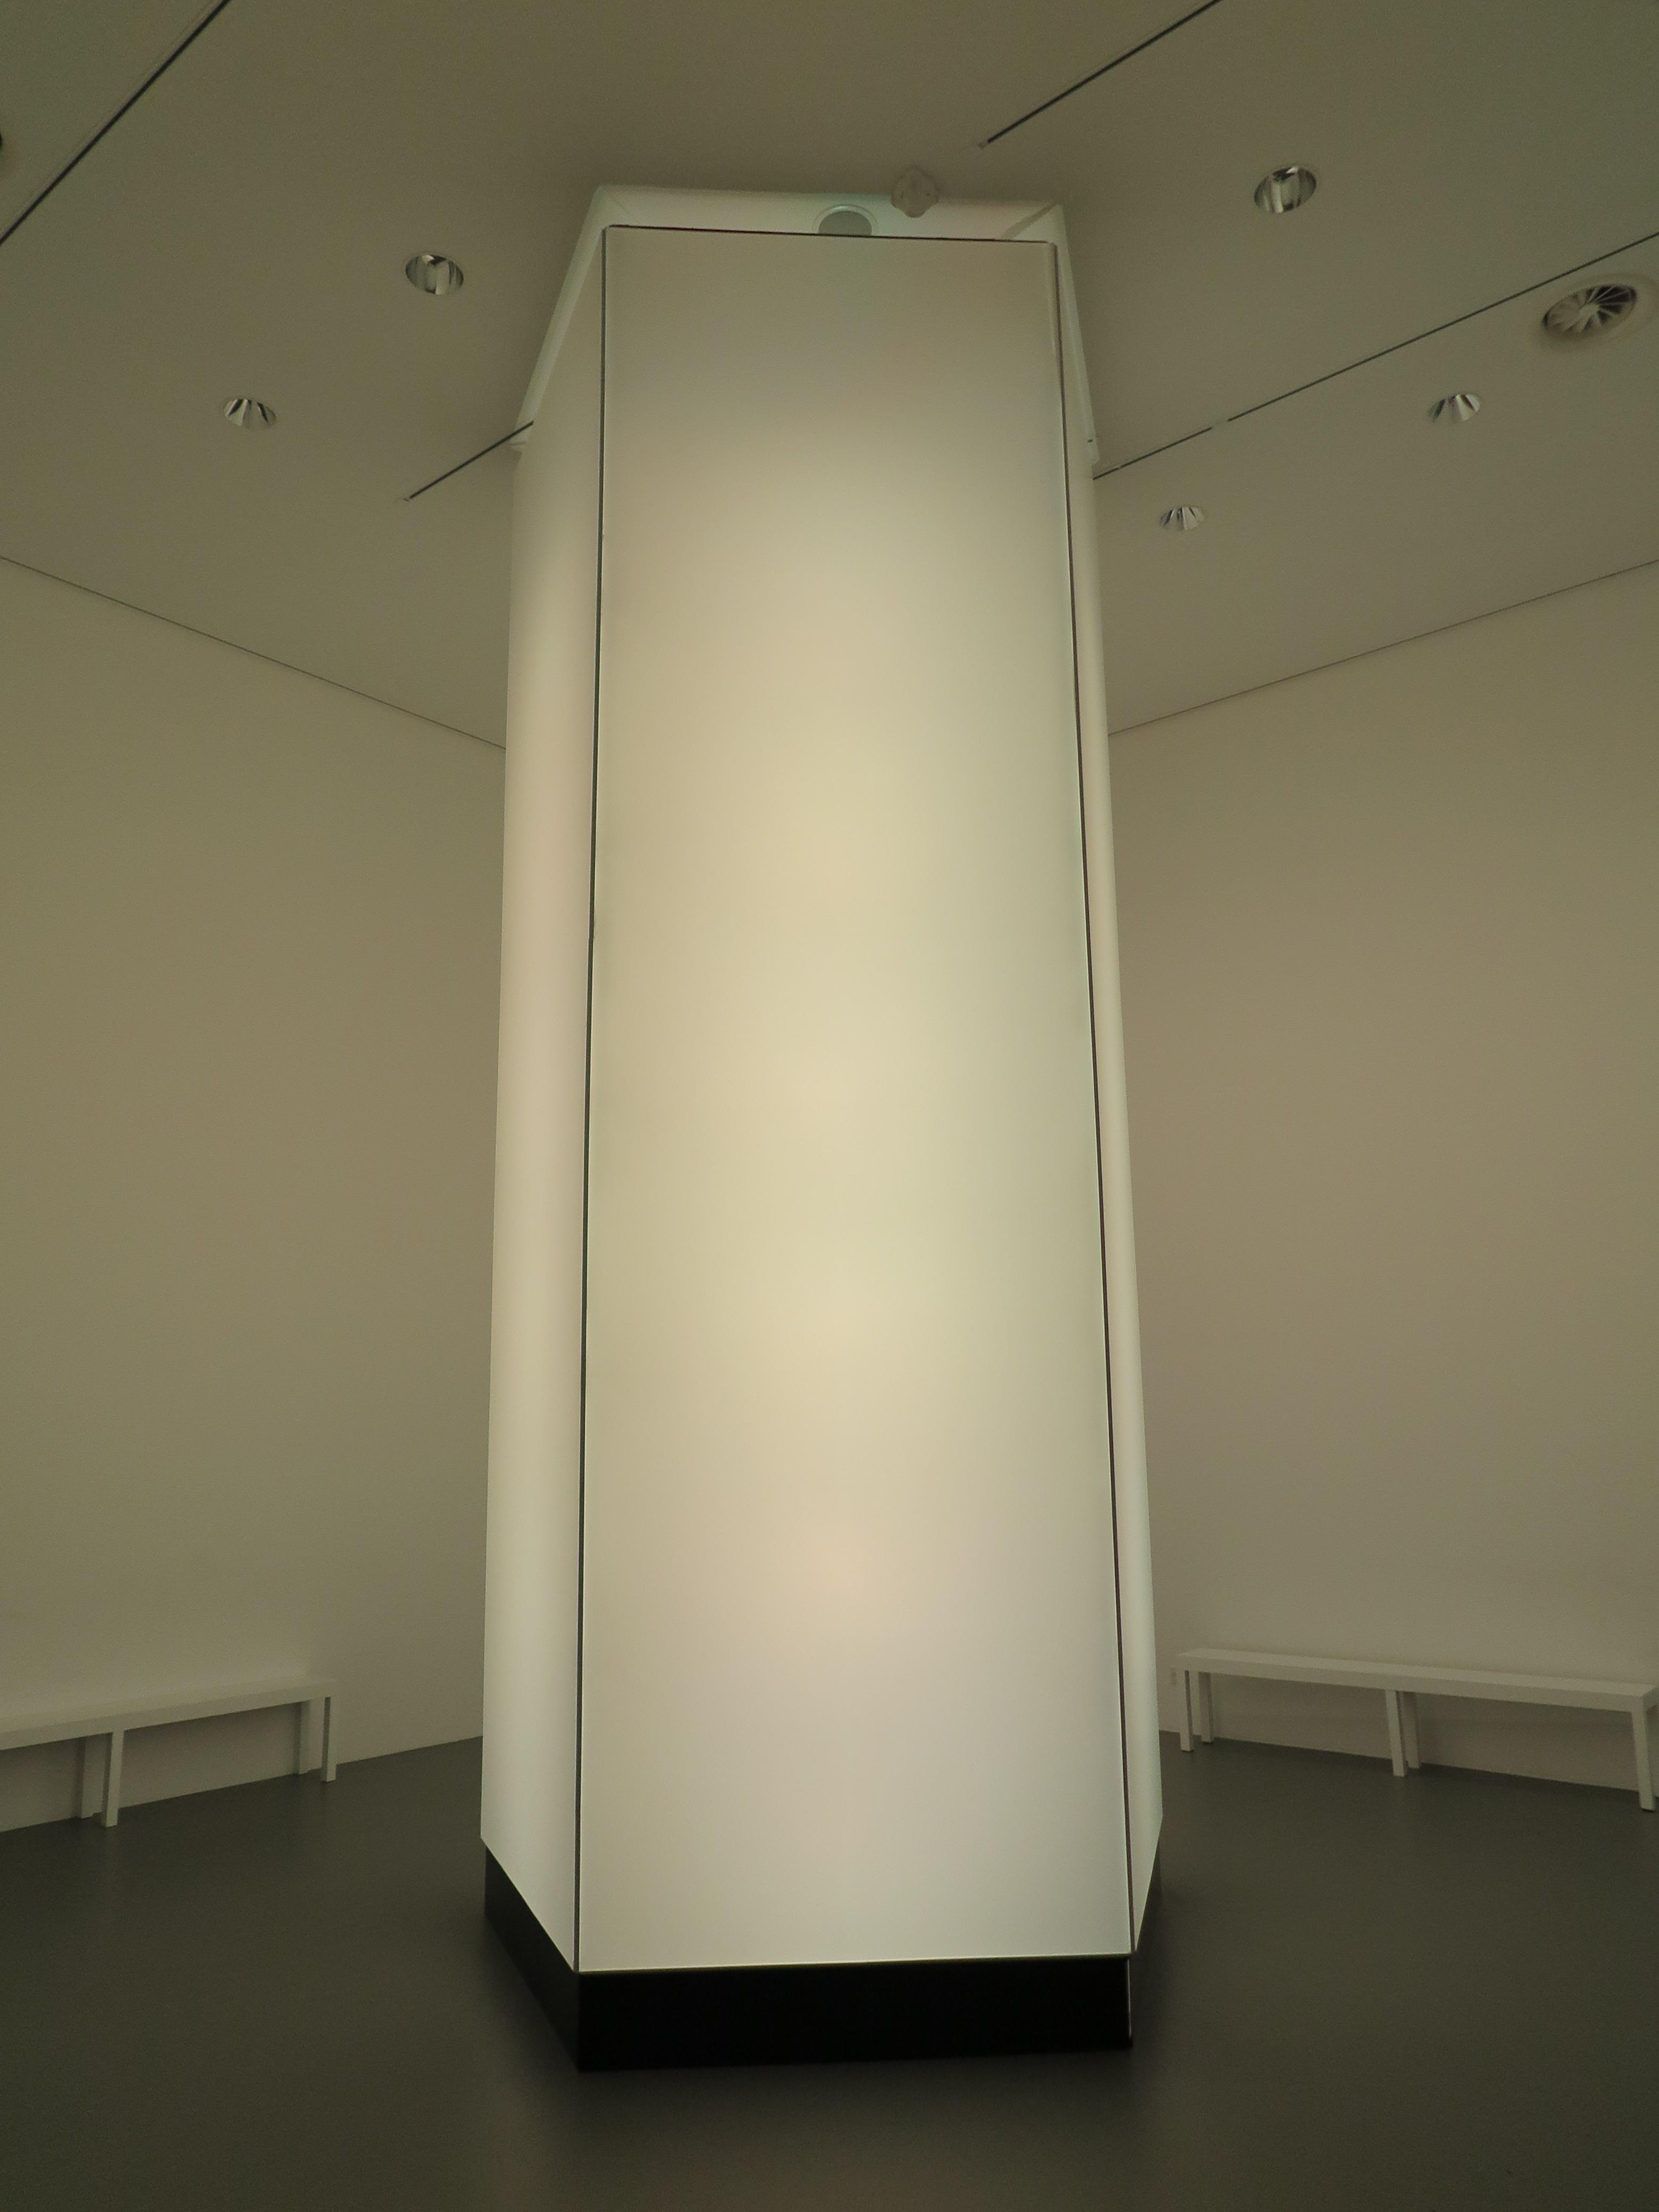 Mathijs Munnik - Common structures - 2013